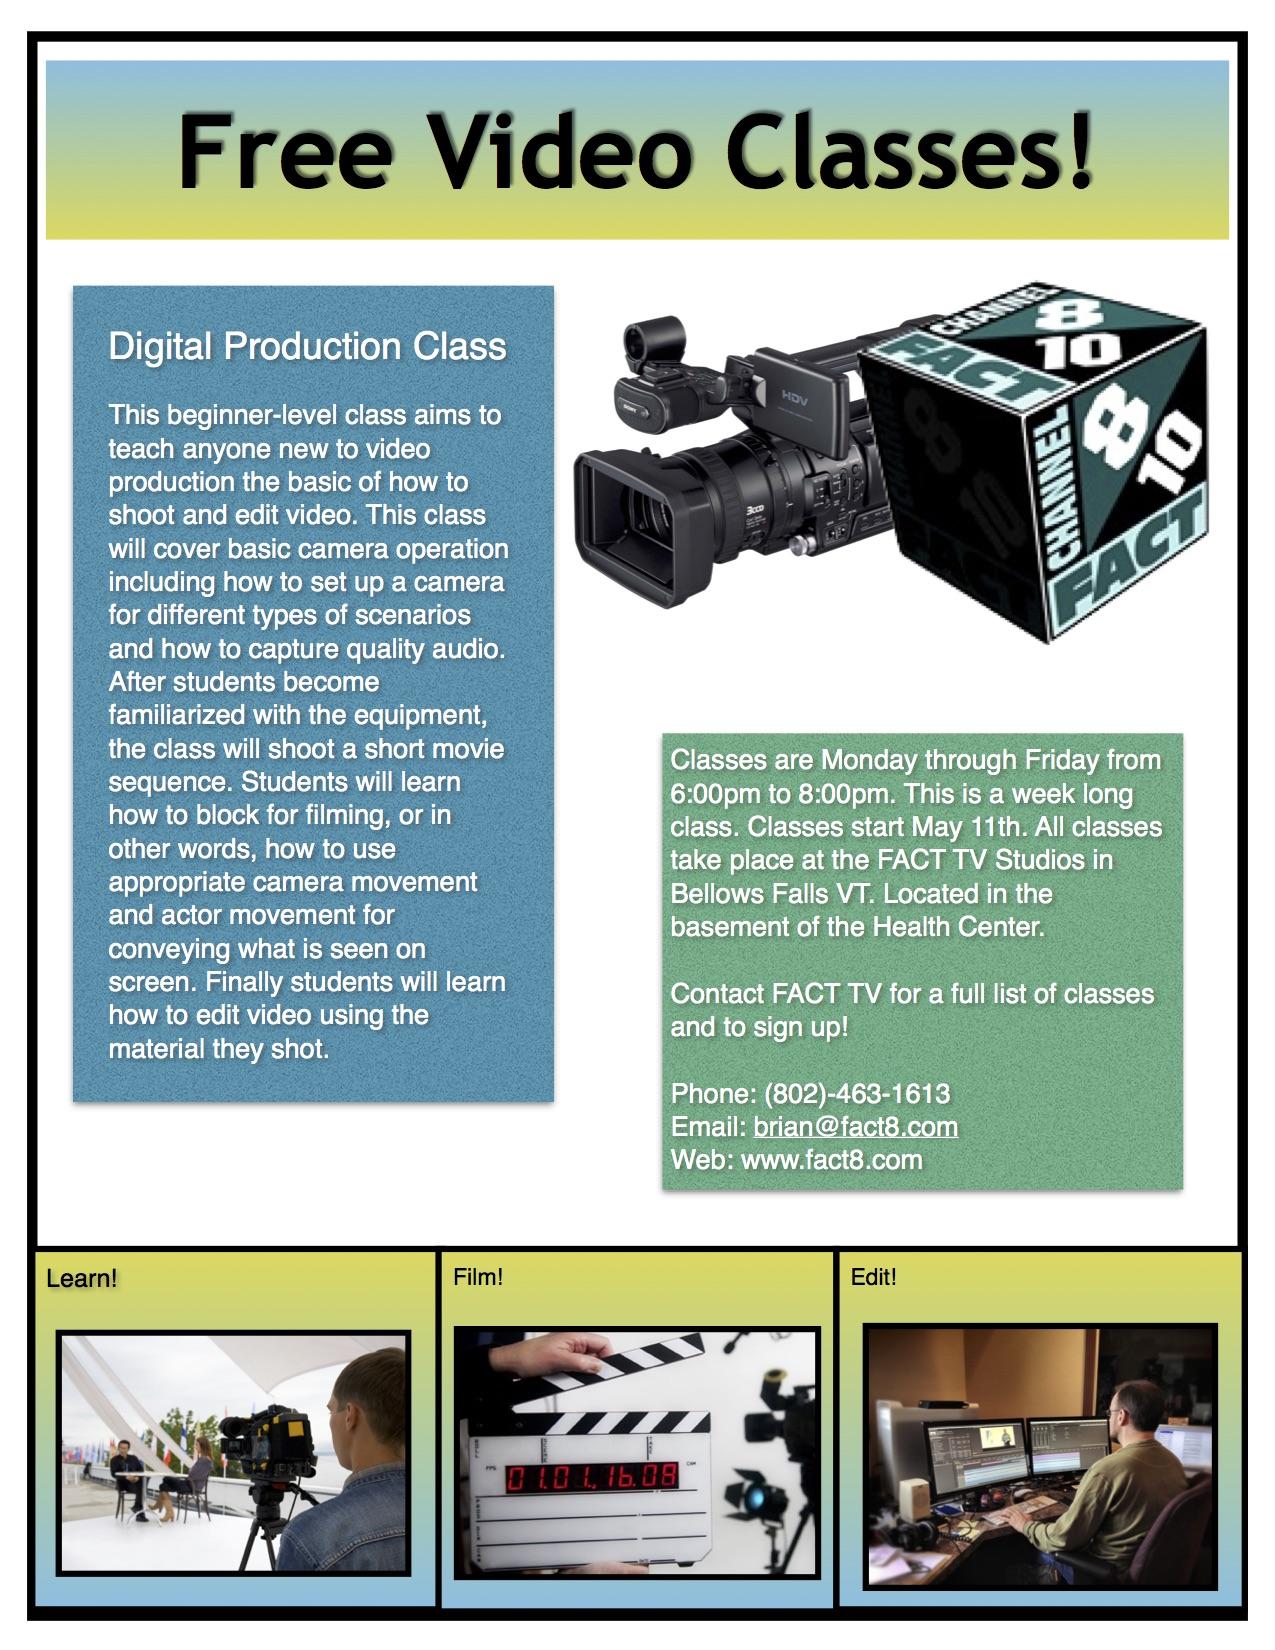 e107_images/custom/flyer_digital_production_class.jpg